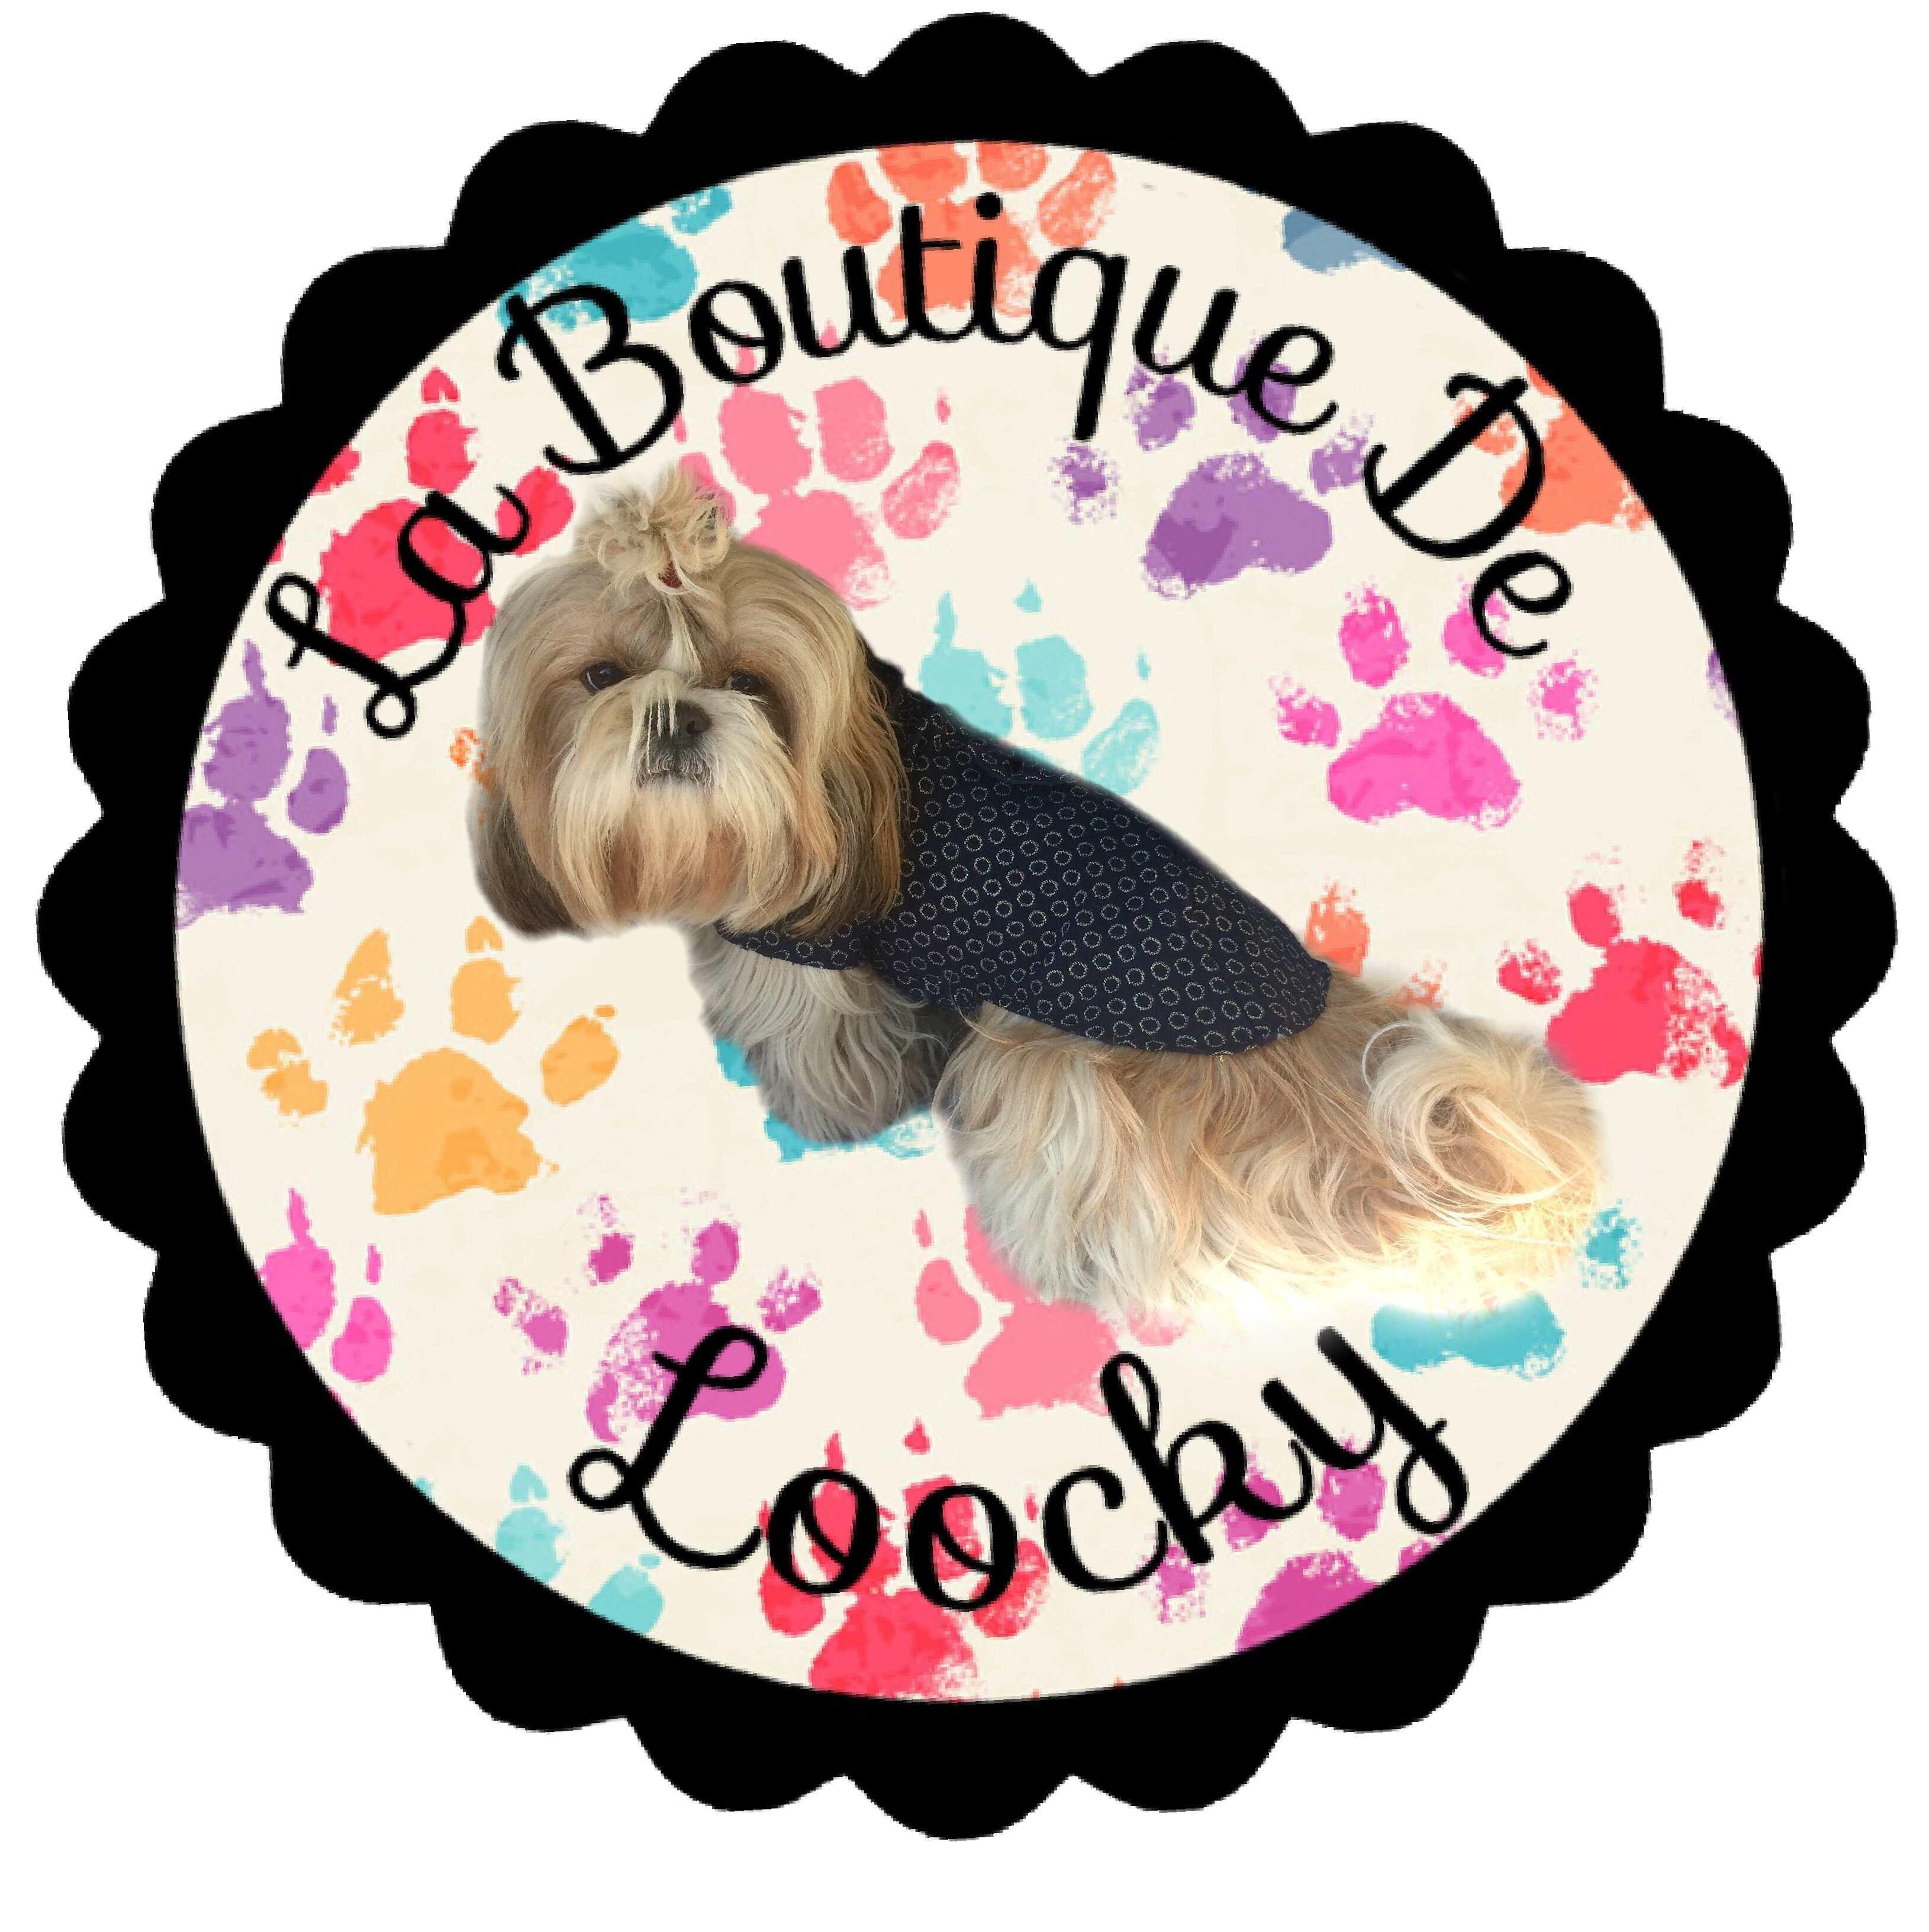 la boutique de loocky animalerie chiens nice 06000 wamiz. Black Bedroom Furniture Sets. Home Design Ideas